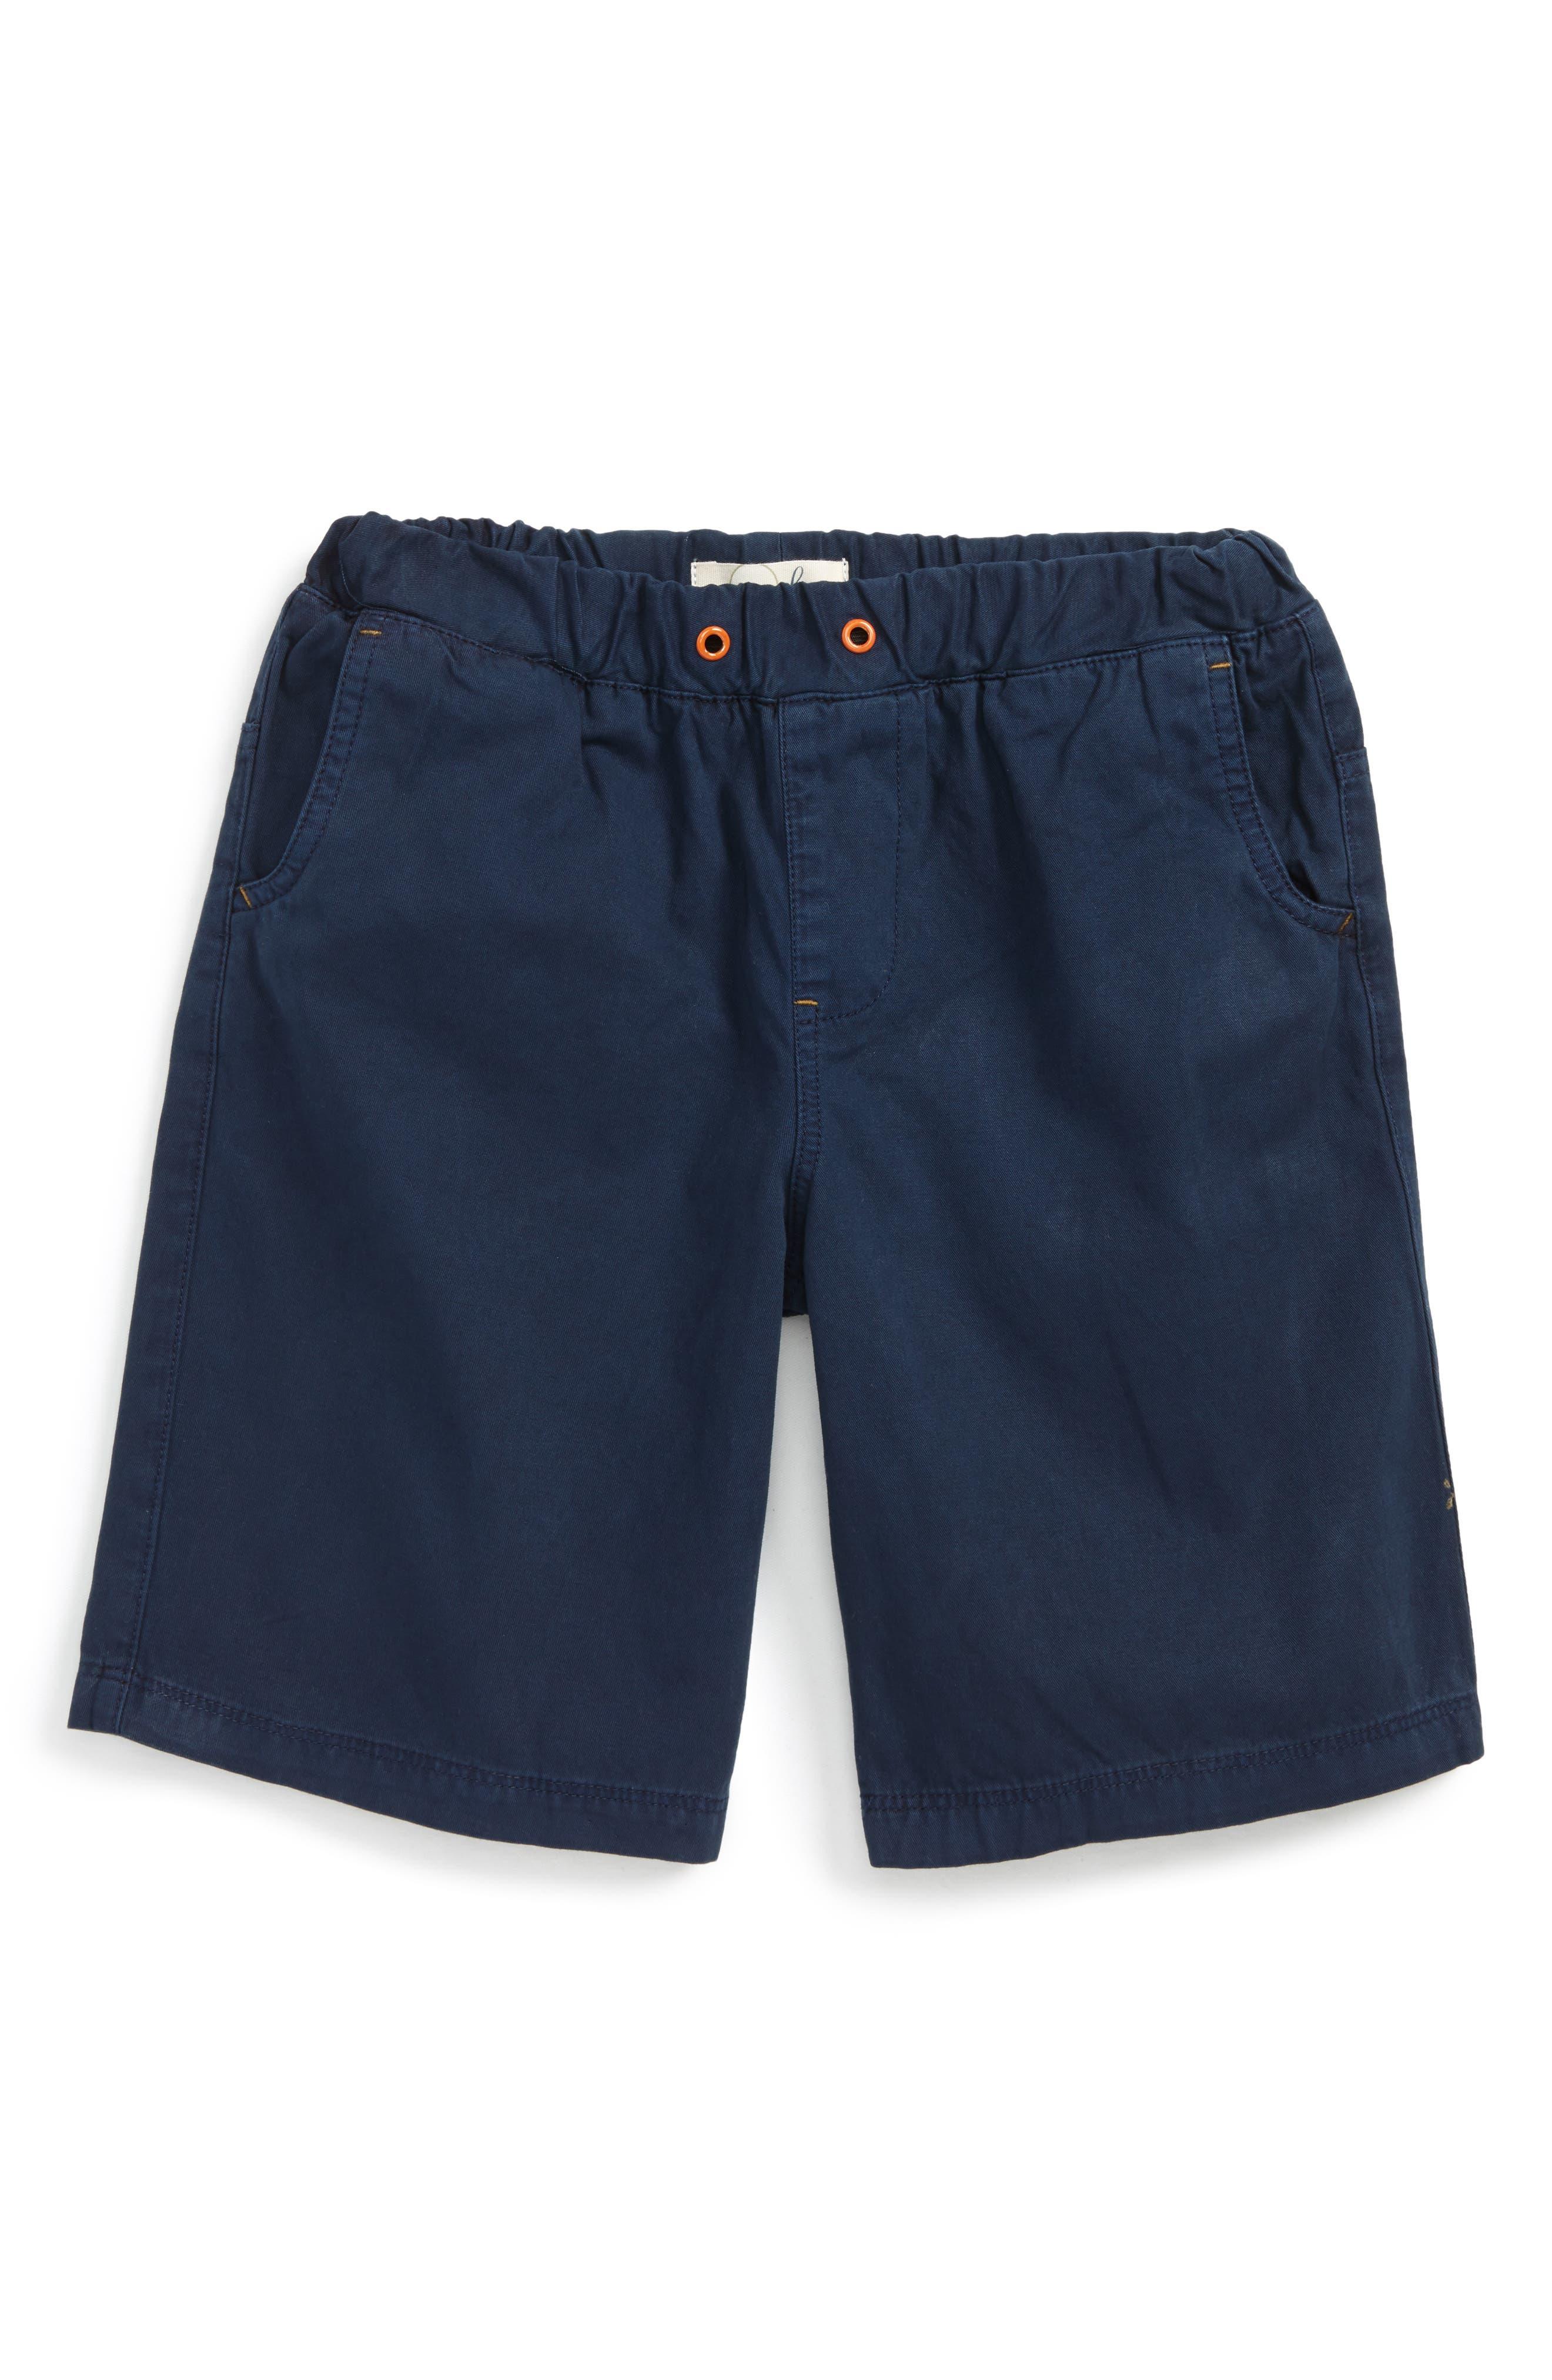 Alternate Image 1 Selected - Peek Morgan Shorts (Toddler Boys, Little Boys & Big Boys)